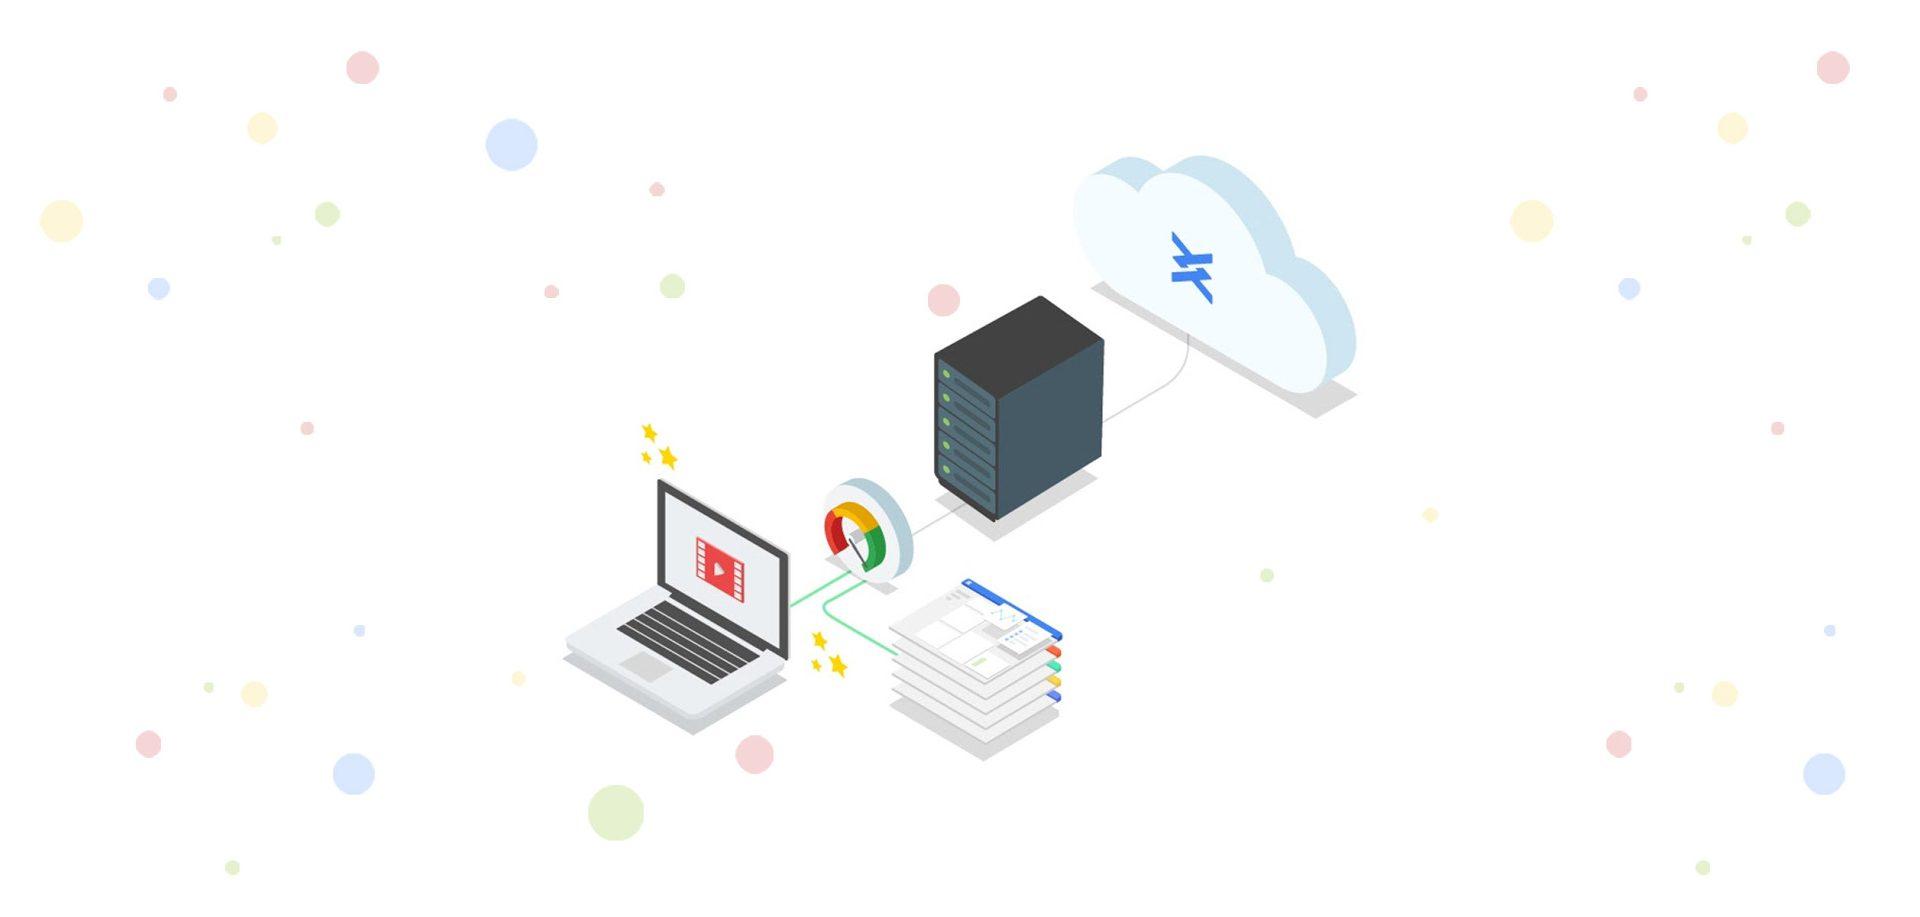 Google Cloud | Compute Engine VMs